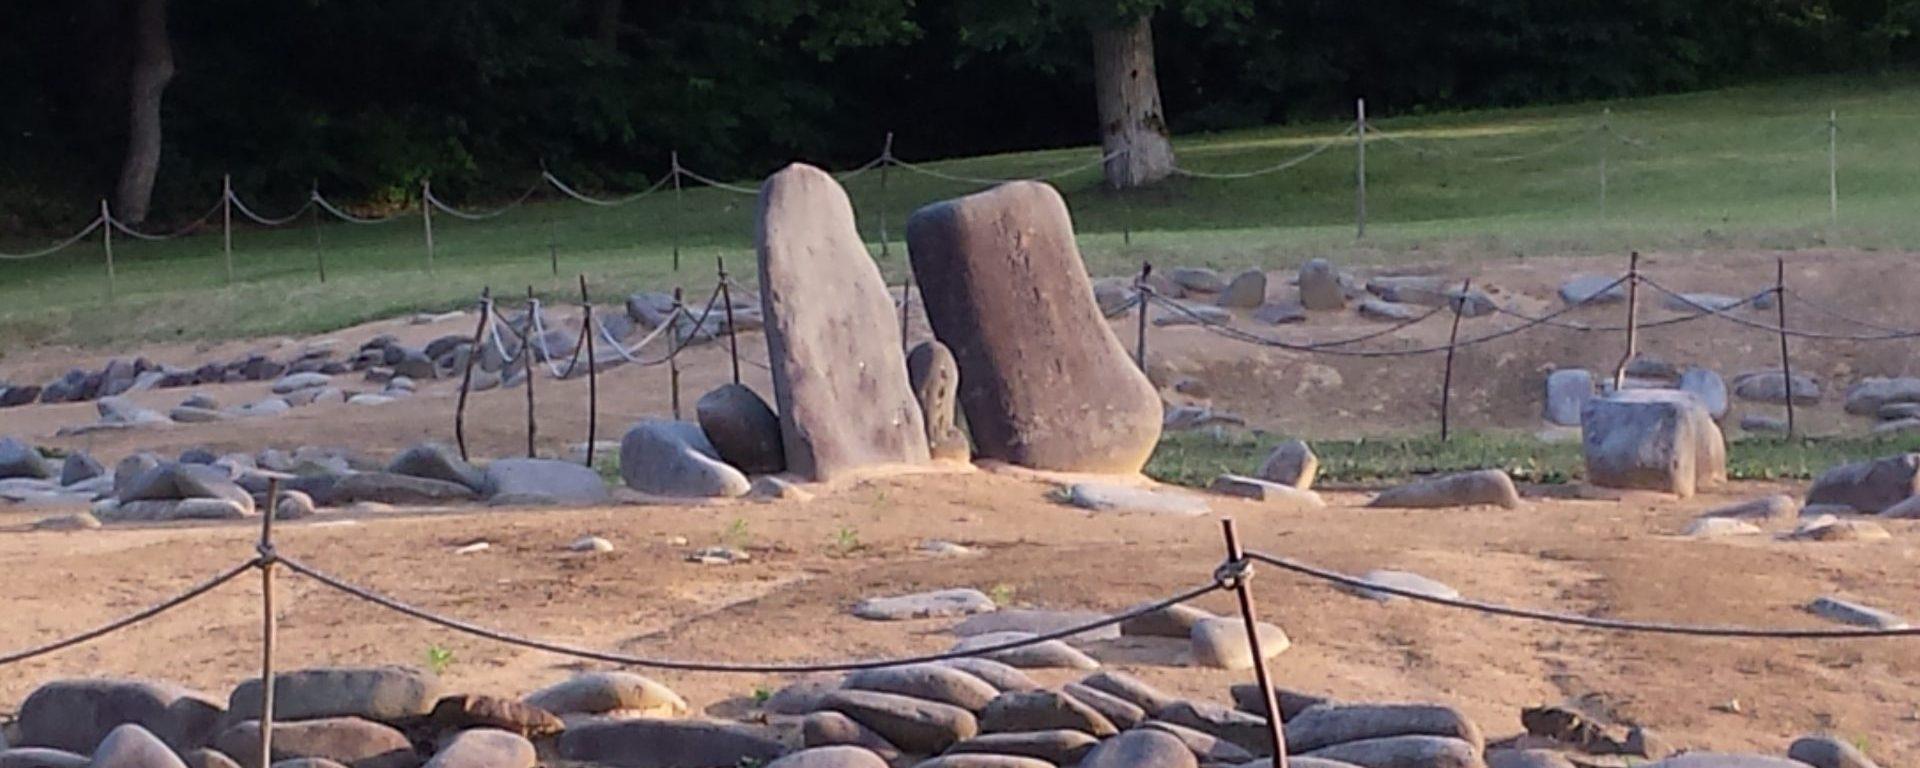 Komakino engraved stones